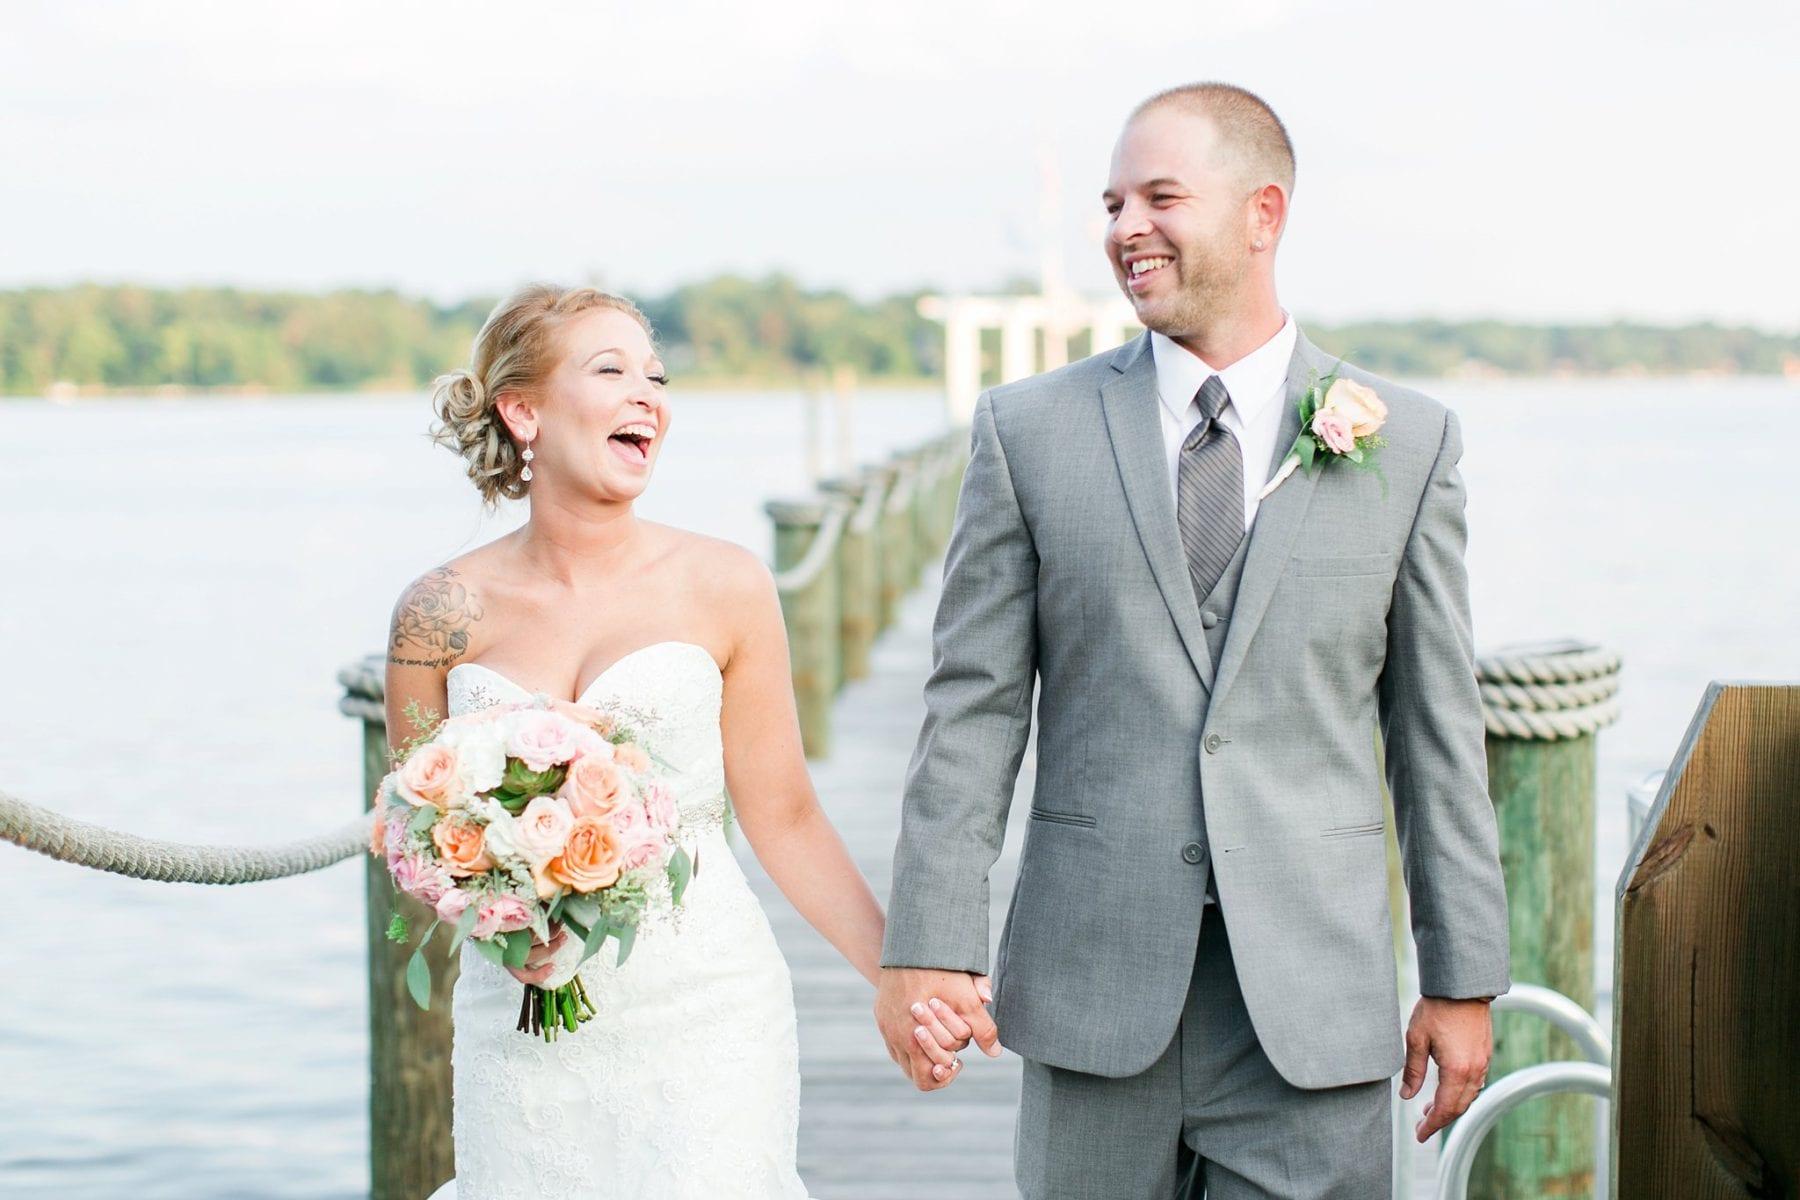 Waters Edge Wedding Photos Maryland Wedding Photographer Megan Kelsey Photography Katie & Conor-561.JPG